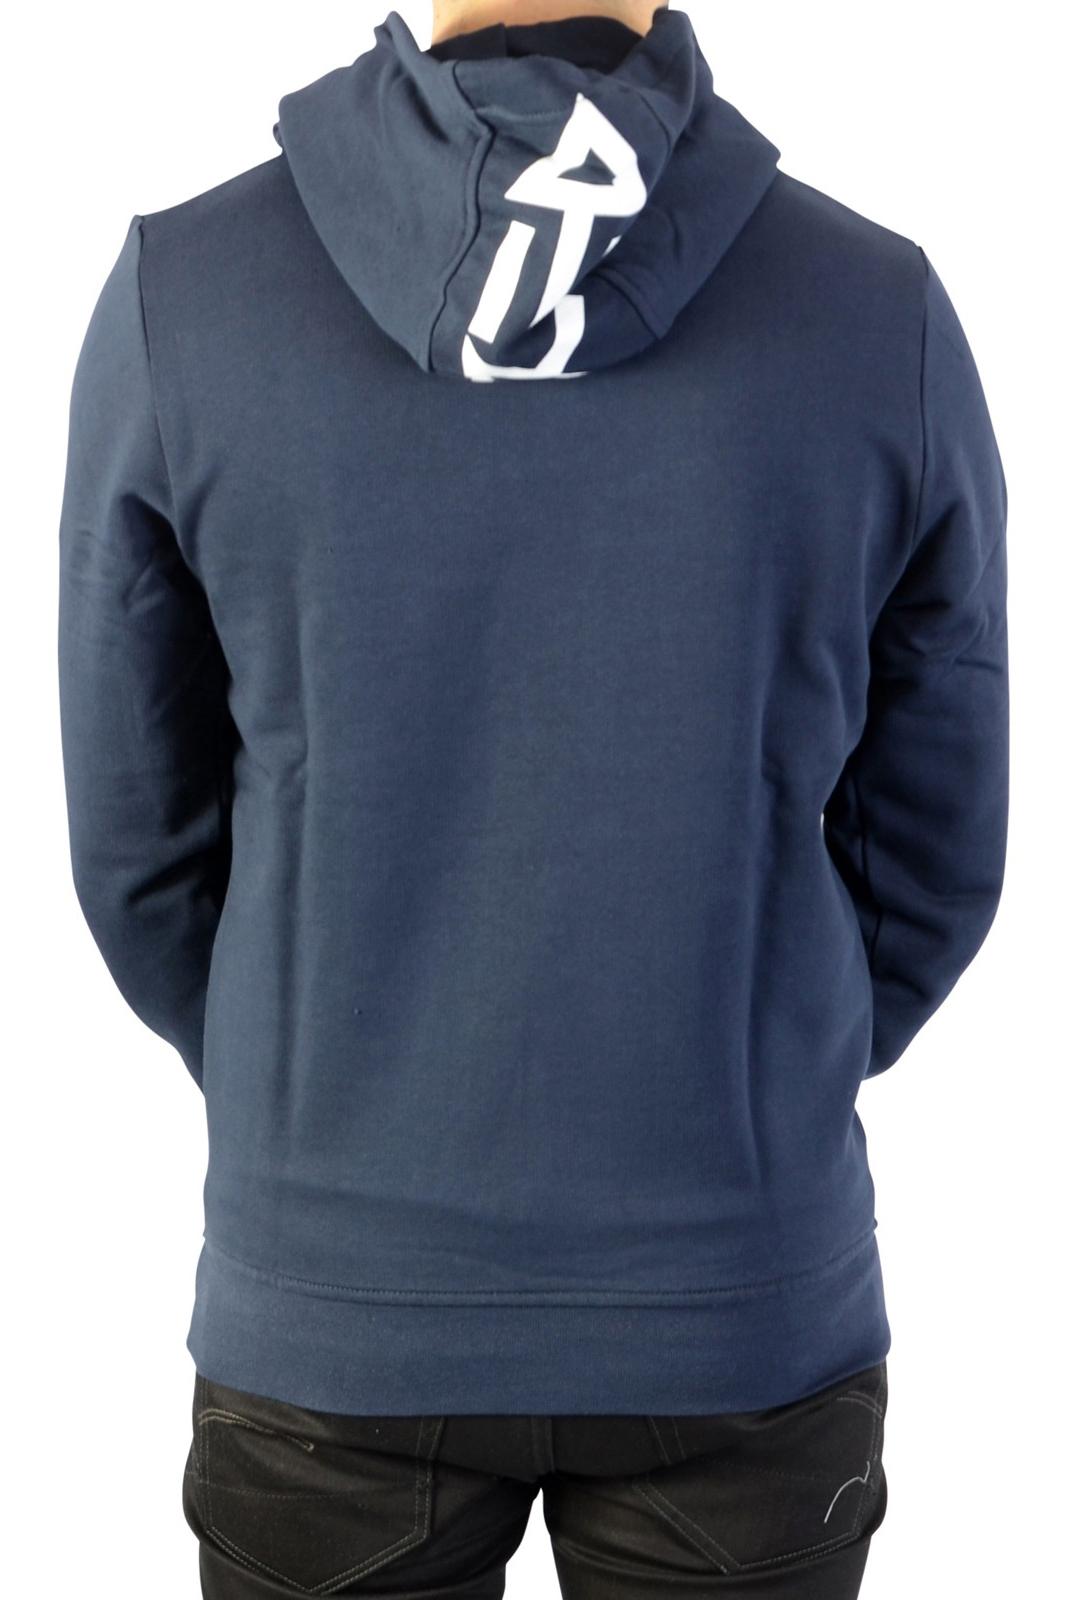 Navy Homme Sweatshirts Spinner Redskins Blue Red84 gUqwz1